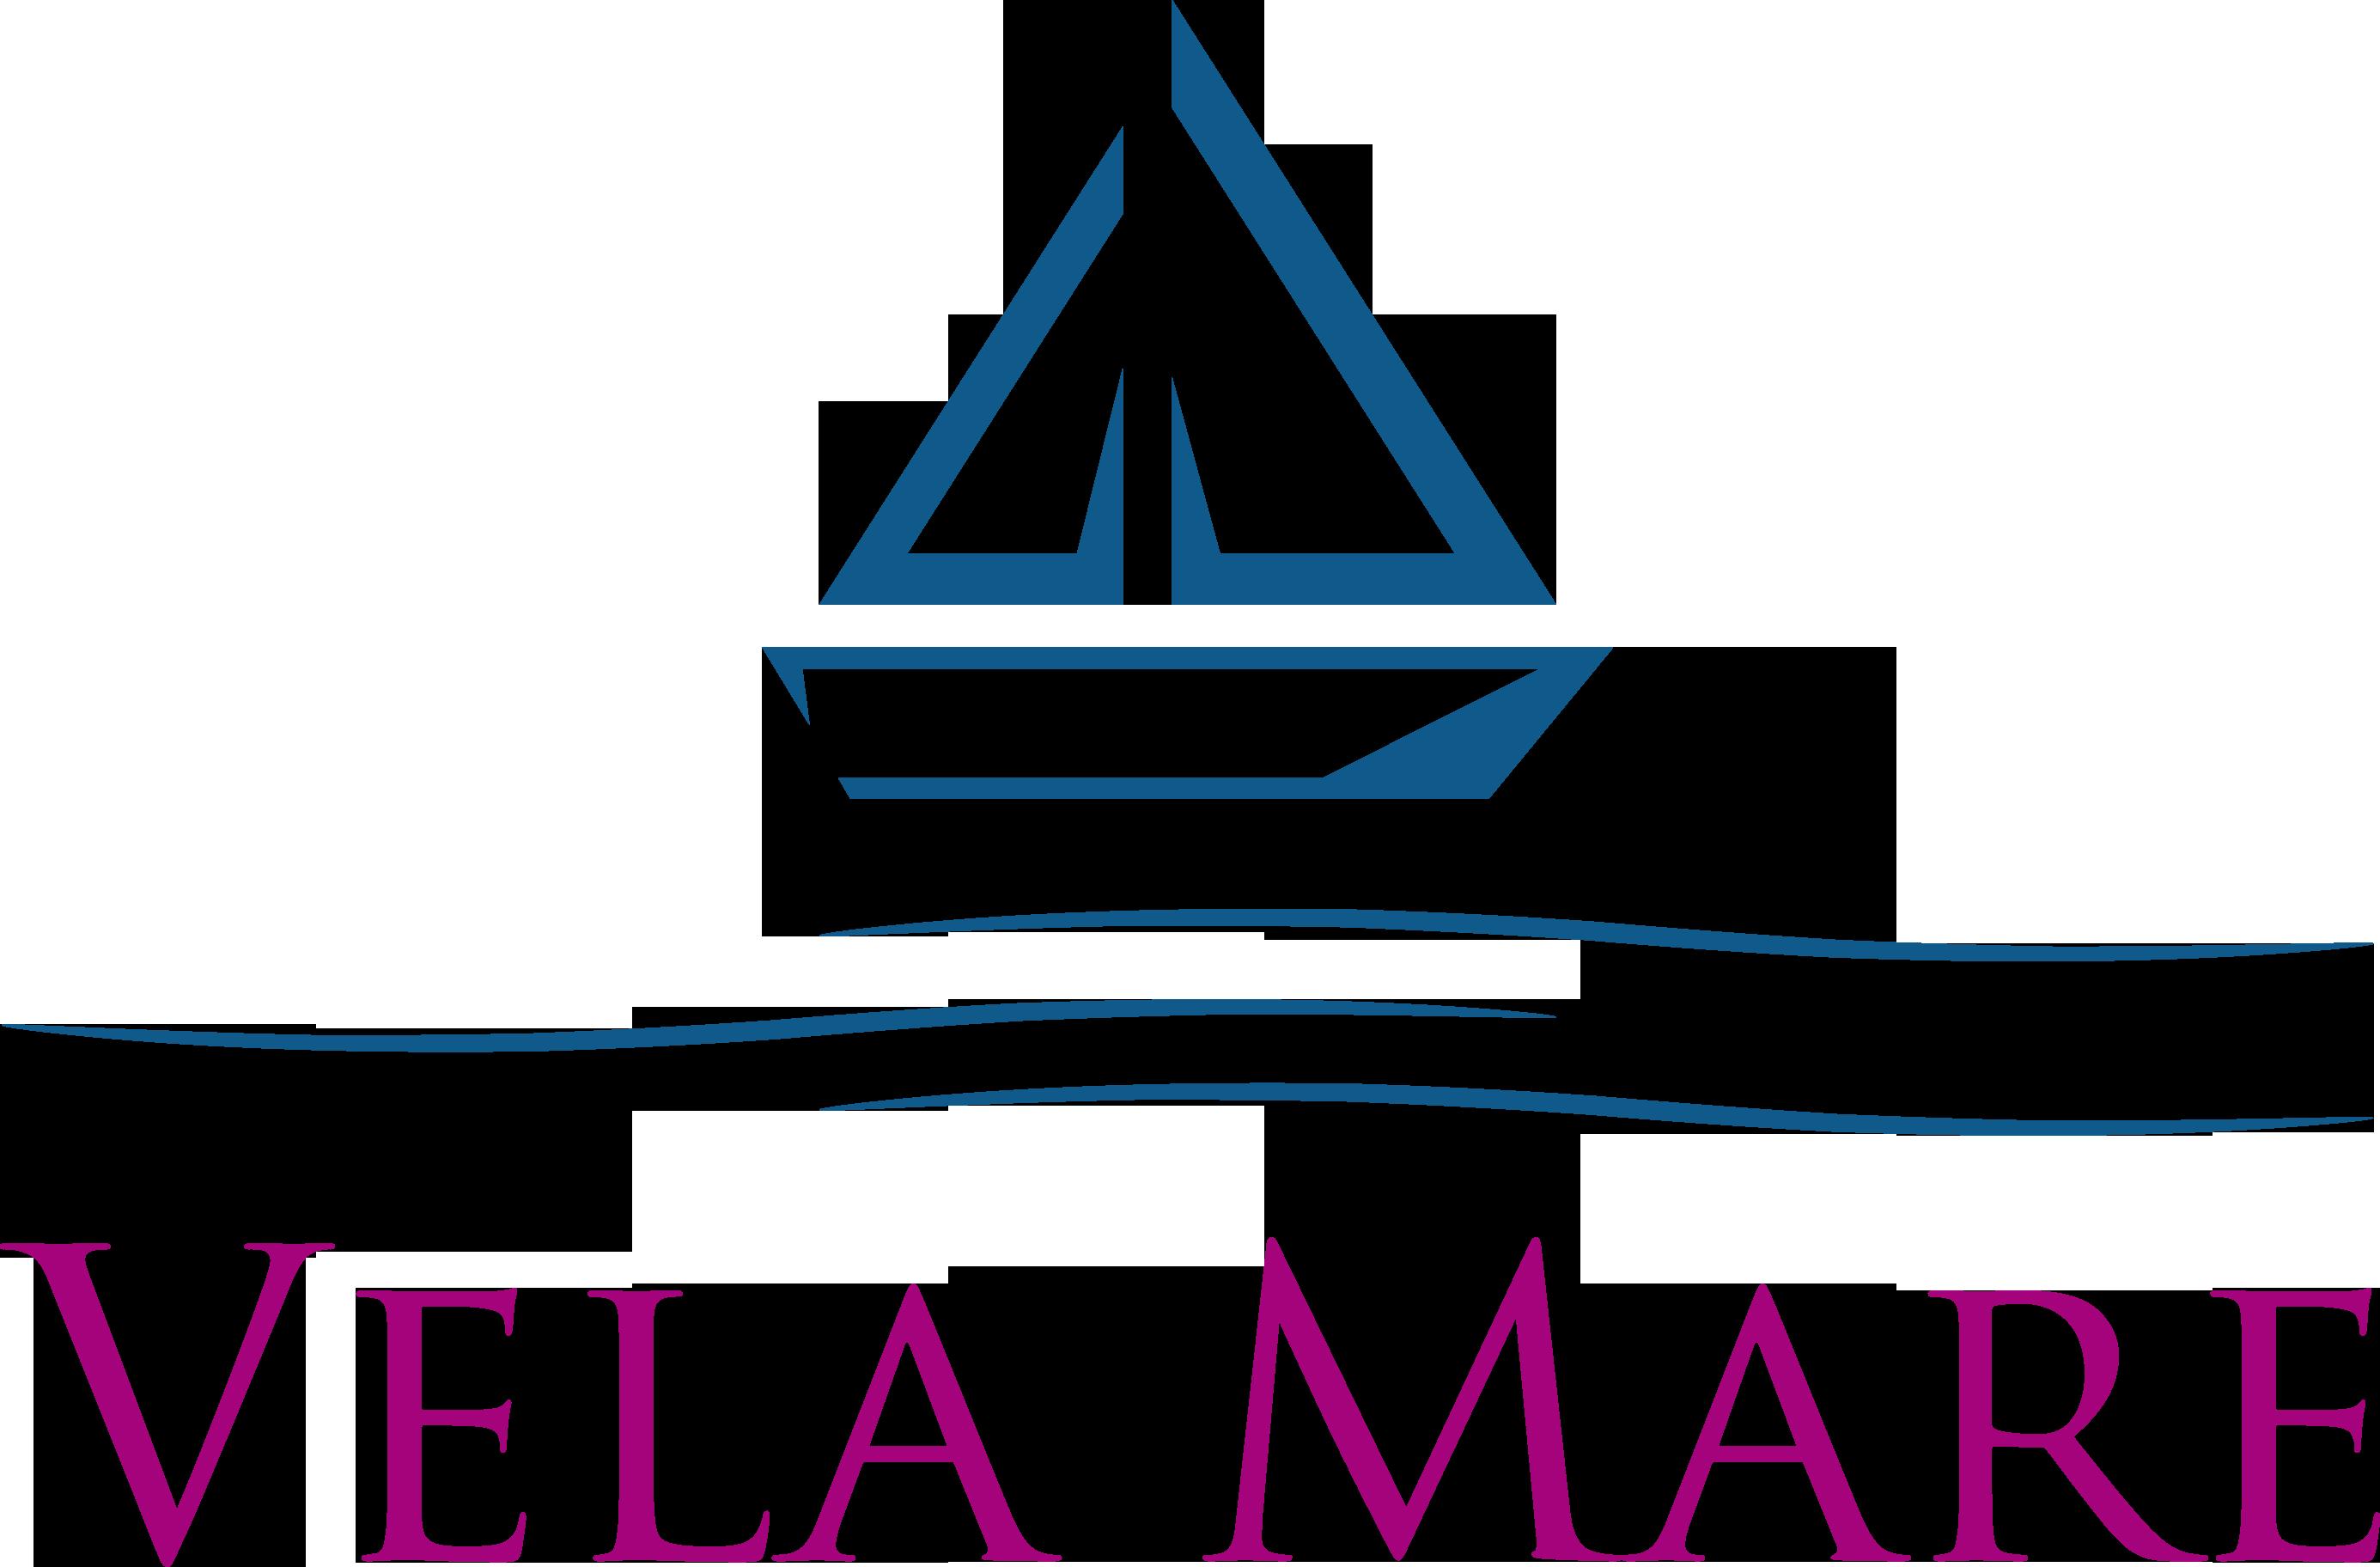 Vela Mare | Apartamenty i noclegi nad morzem Dziwnówek